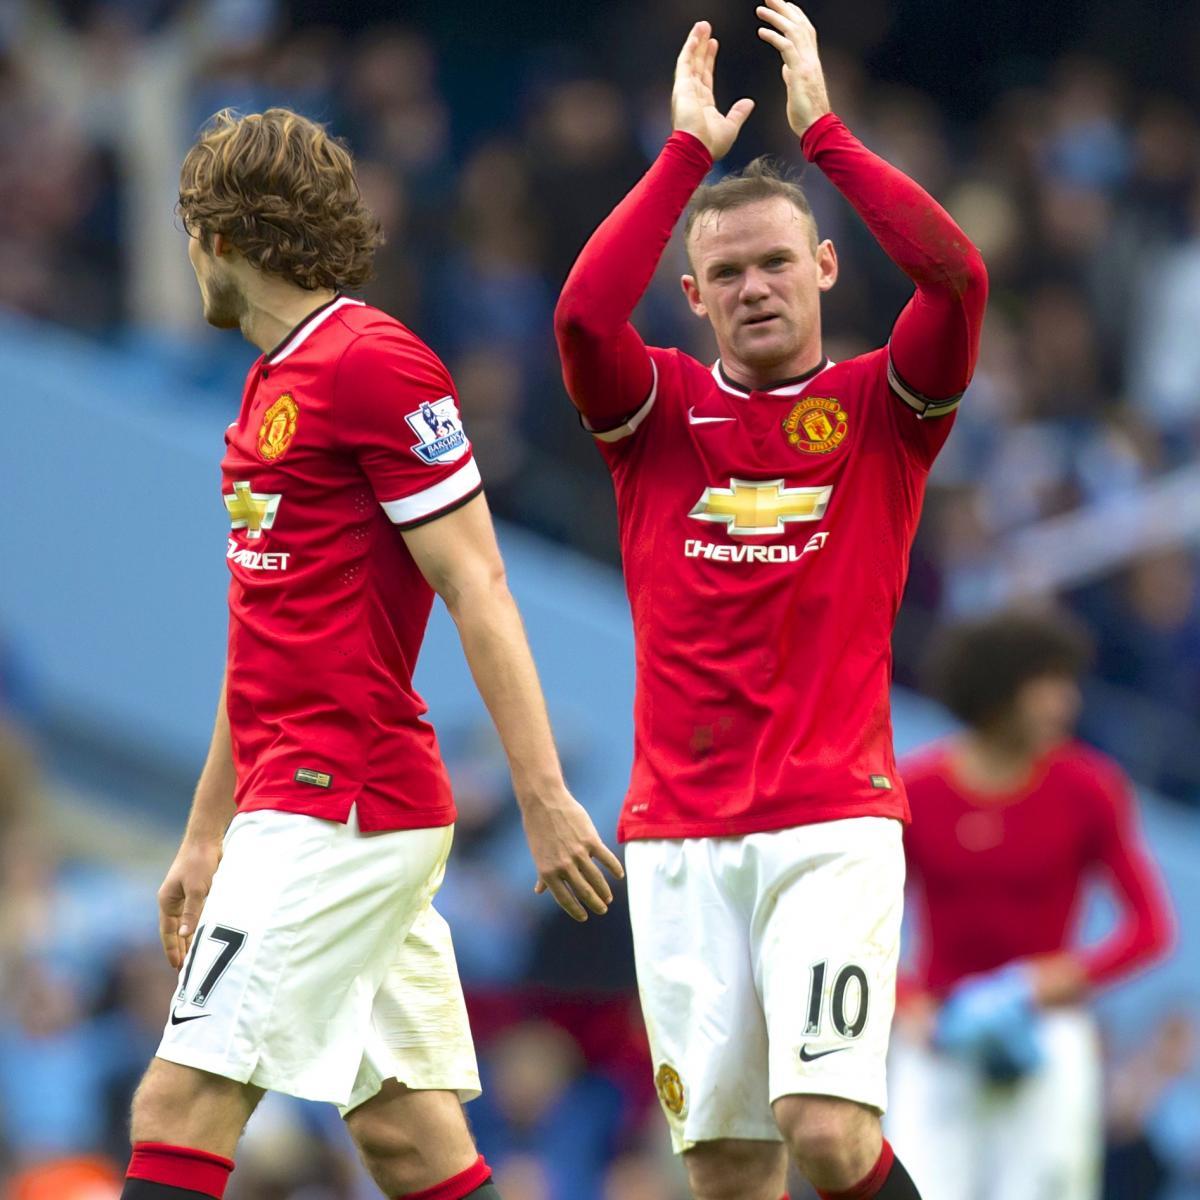 Psg Vs Manchester City Live Score Highlights From: Manchester United Vs. Hull City: Live Score, Highlights